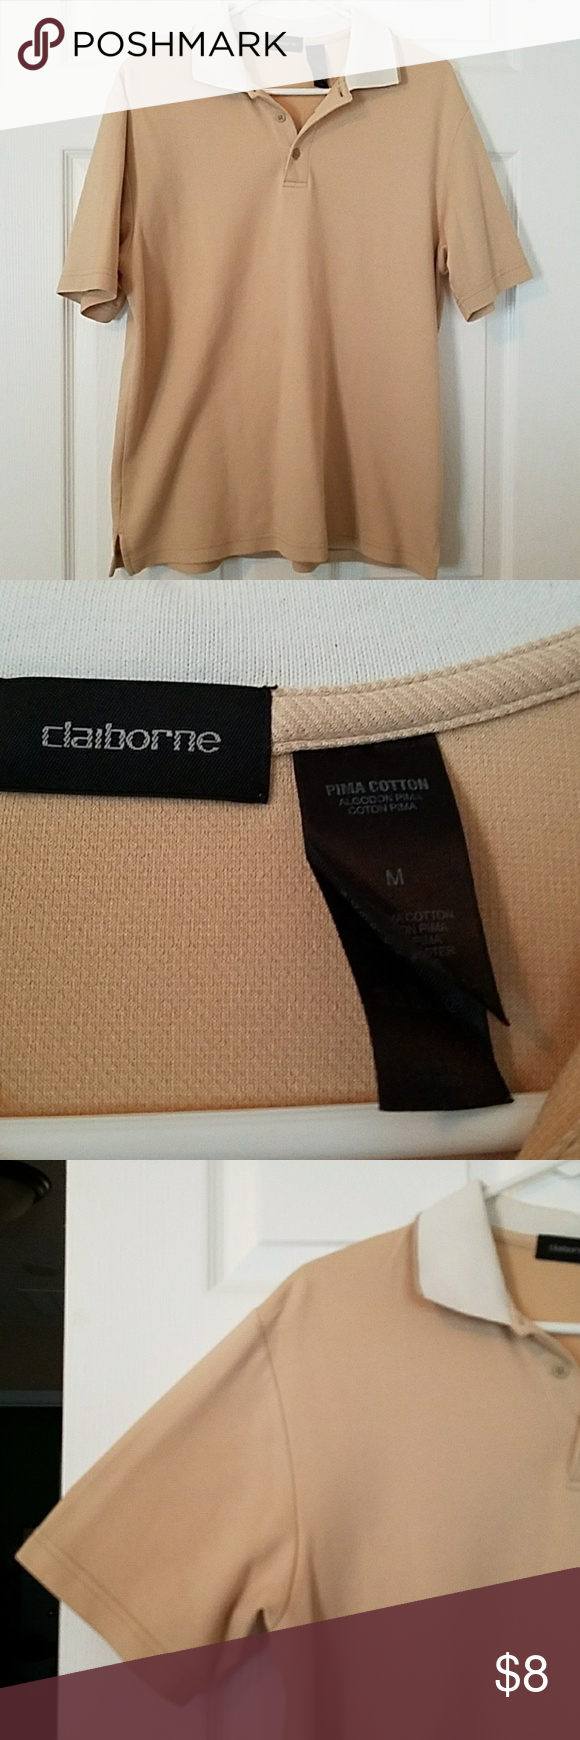 Claiborne Short Sleeved Shirt Claiborne Short Sleeved Shirt.  Size Medium Claiborne Shirts